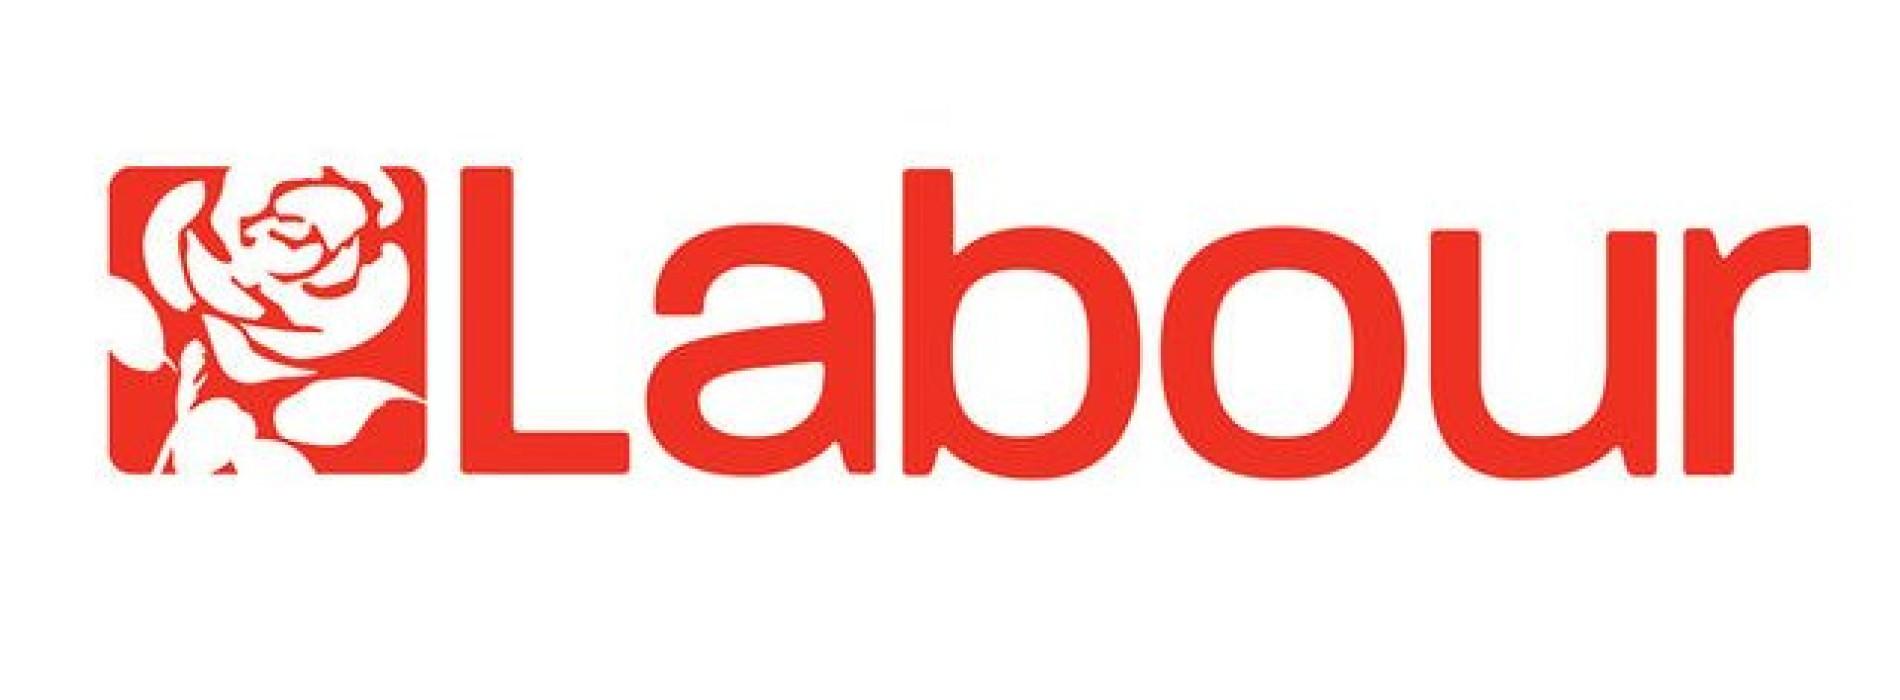 Labour Party   John Peel Wiki   FANDOM powered by Wikia